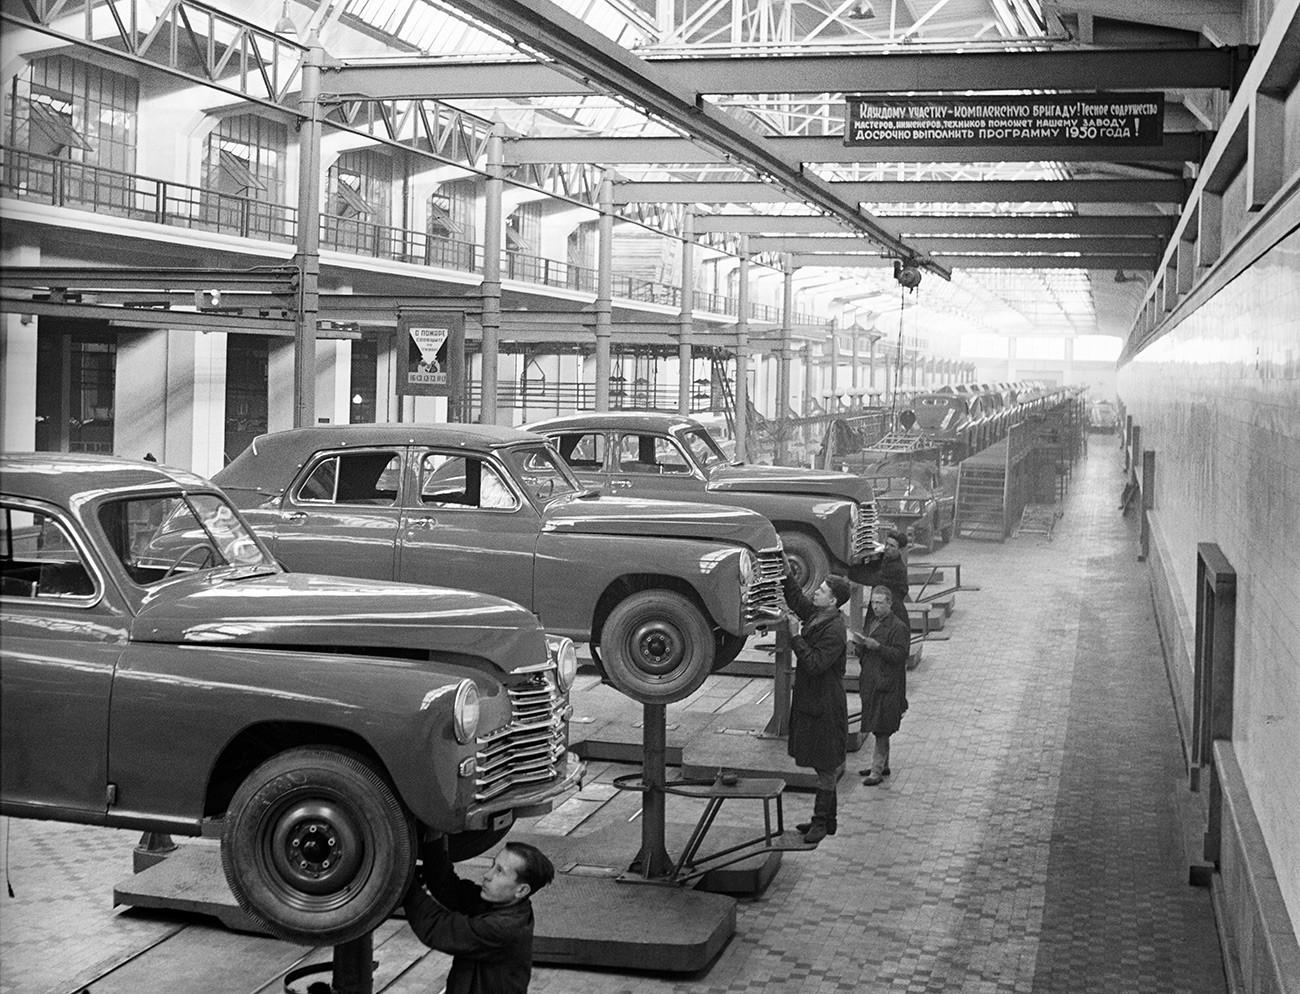 Taller de ensamblaje de automóviles M-20 (